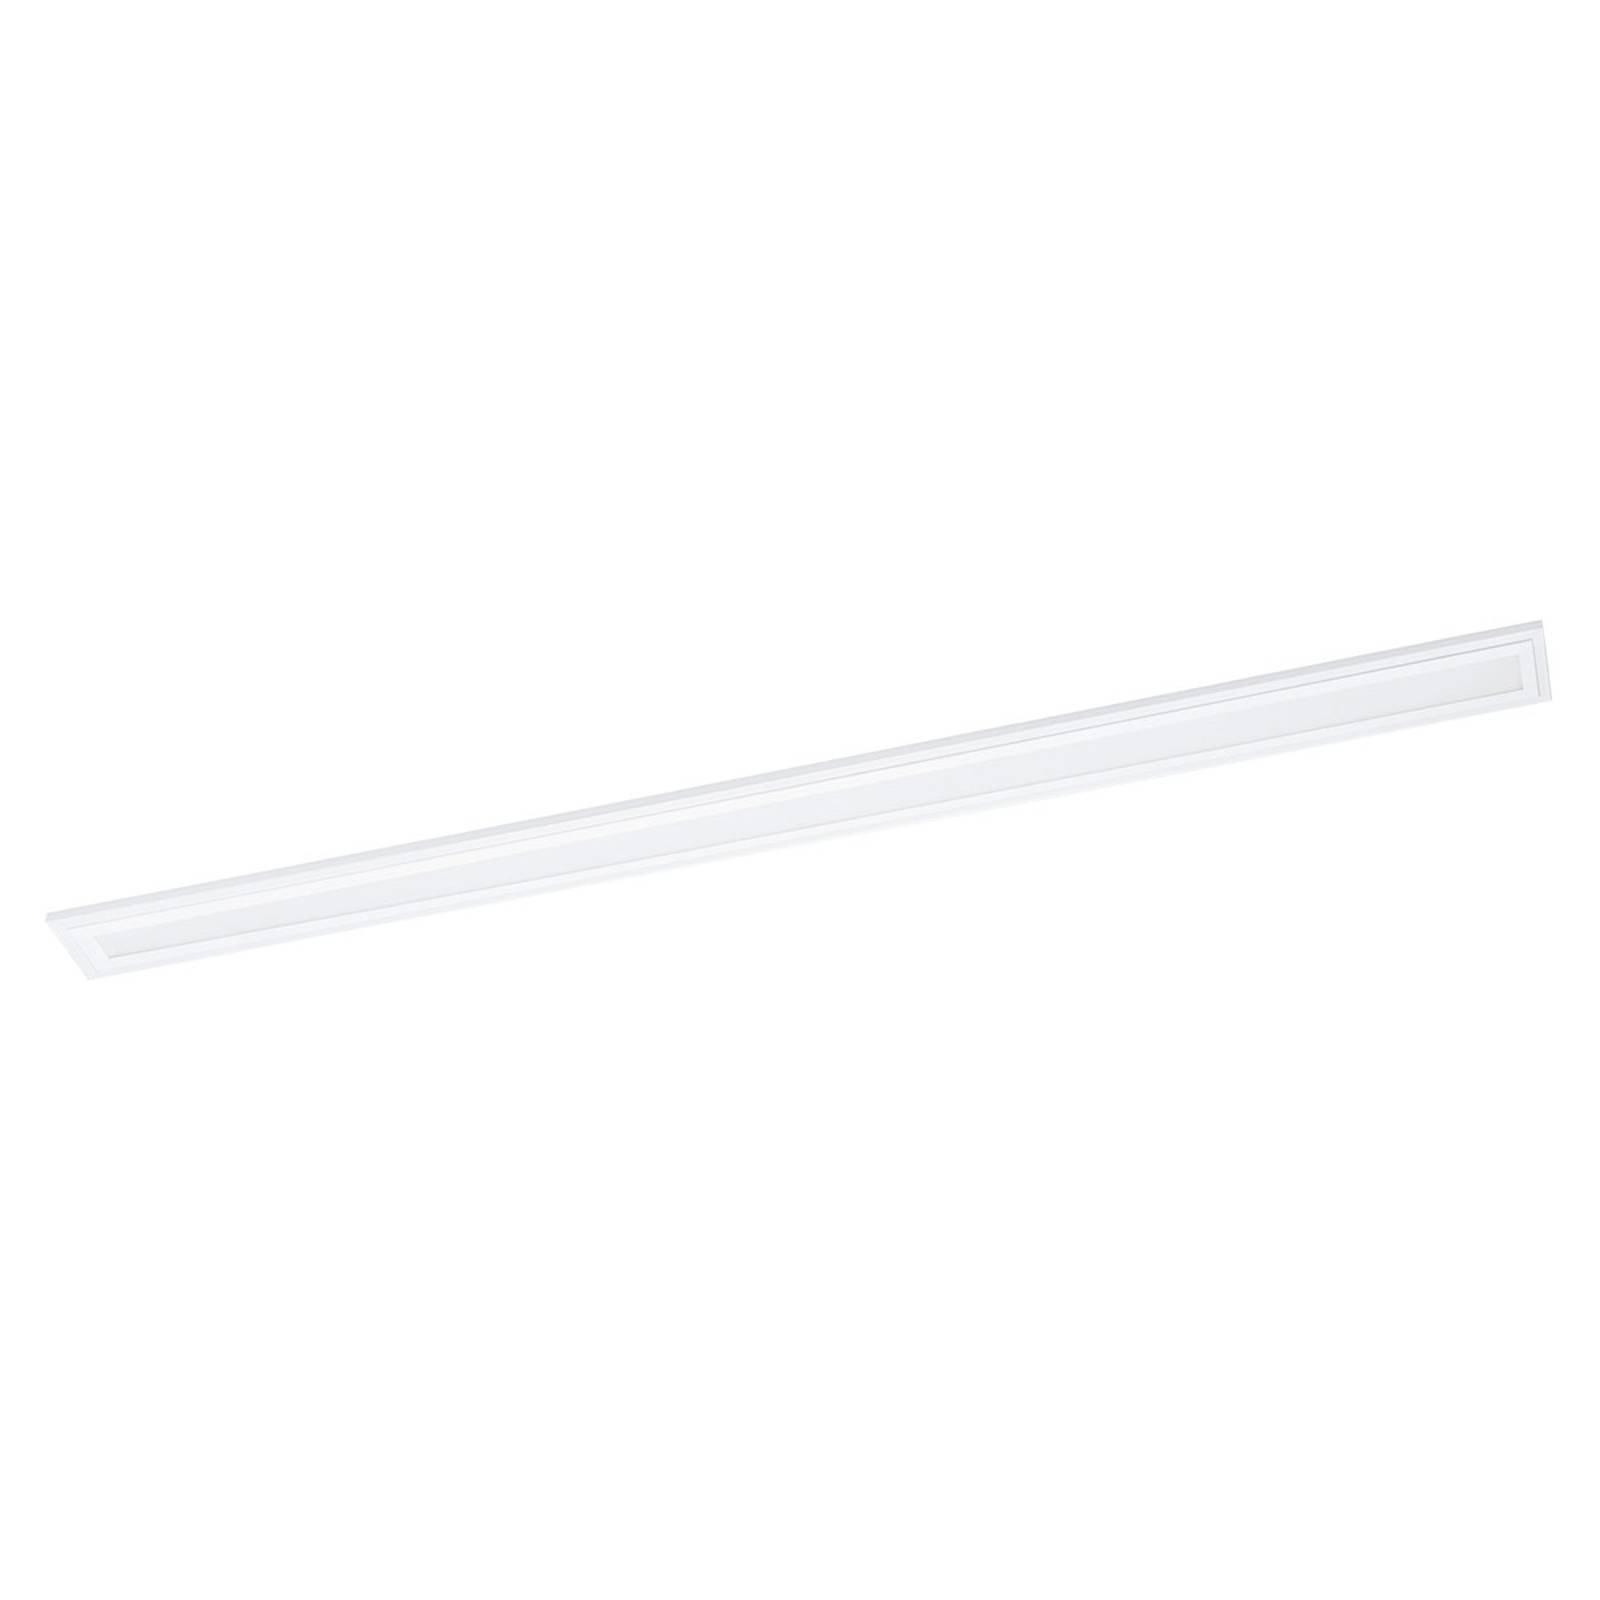 LED-taklampe Salobrena 2, aluminium hvit